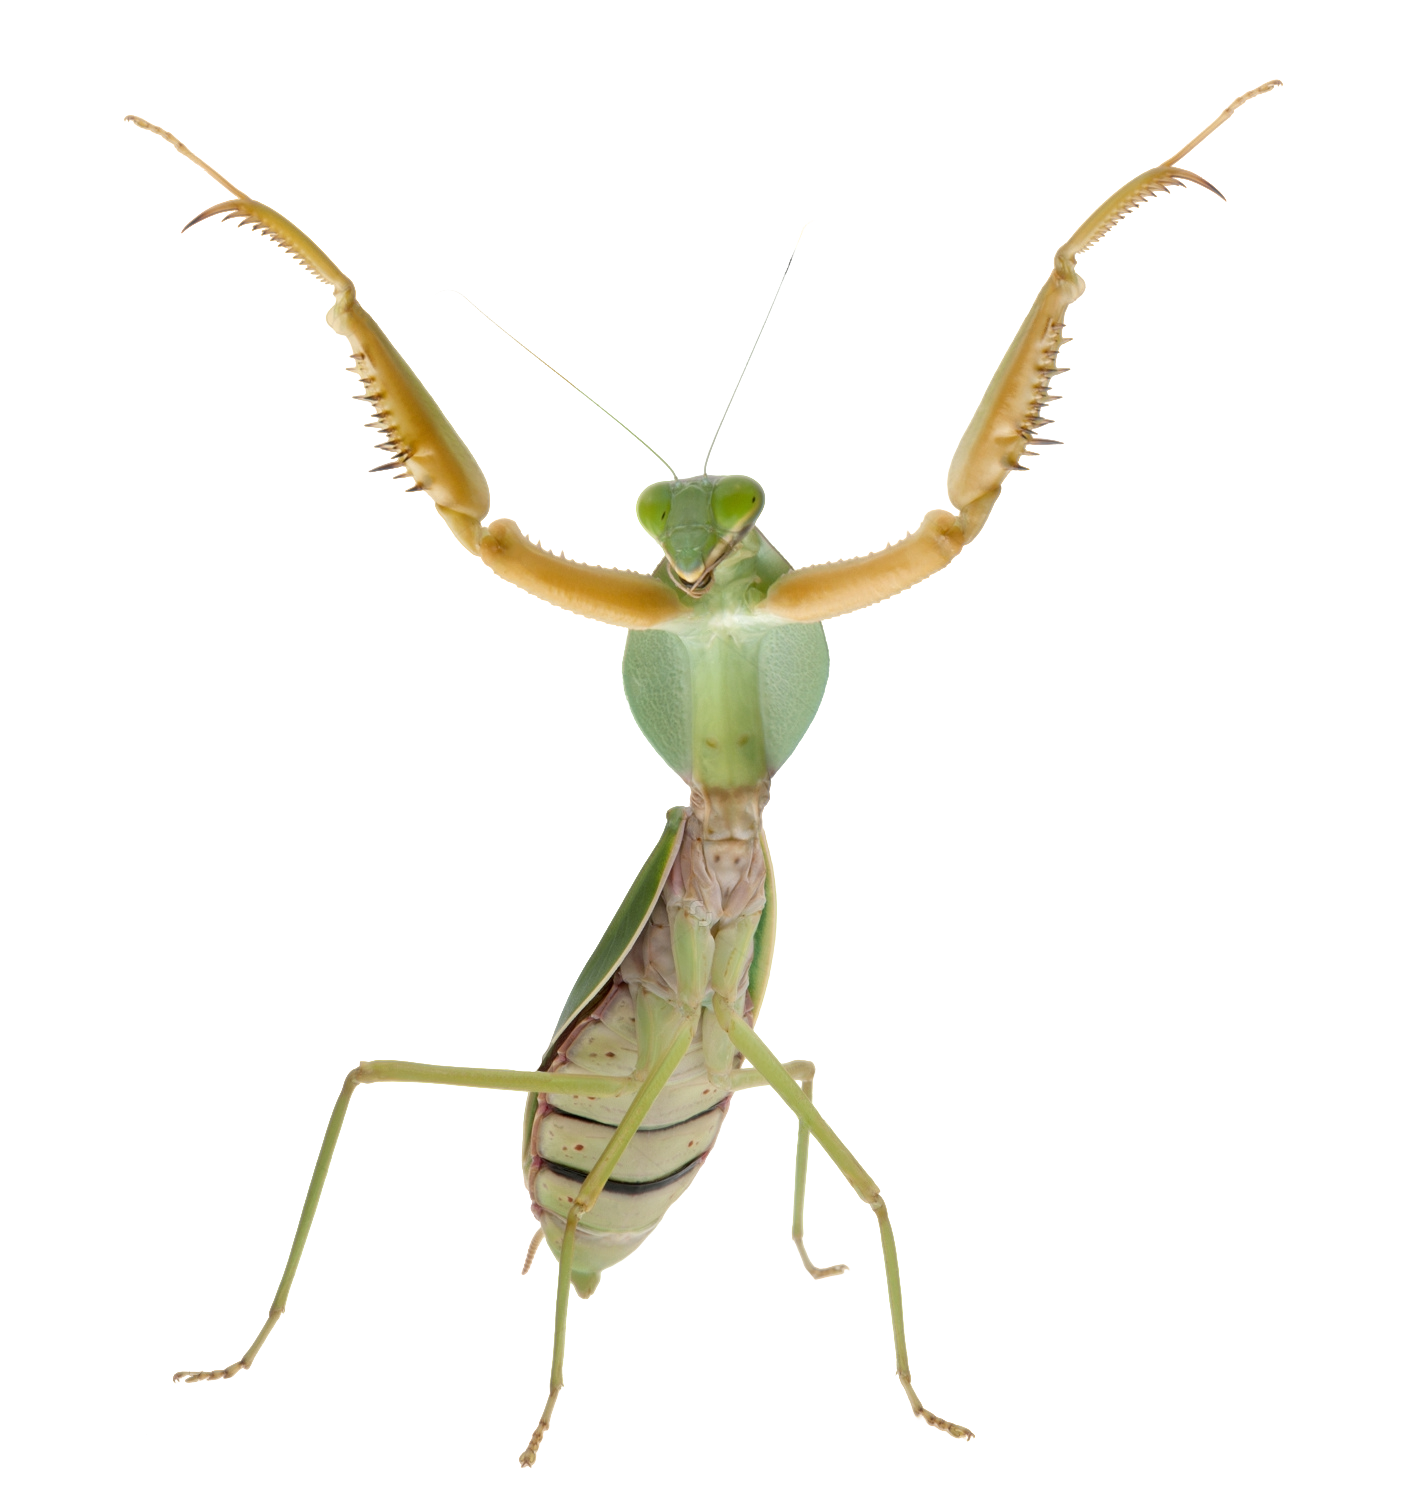 Praying Mantis Standing Up Praying Mantis Stand Up Cutout